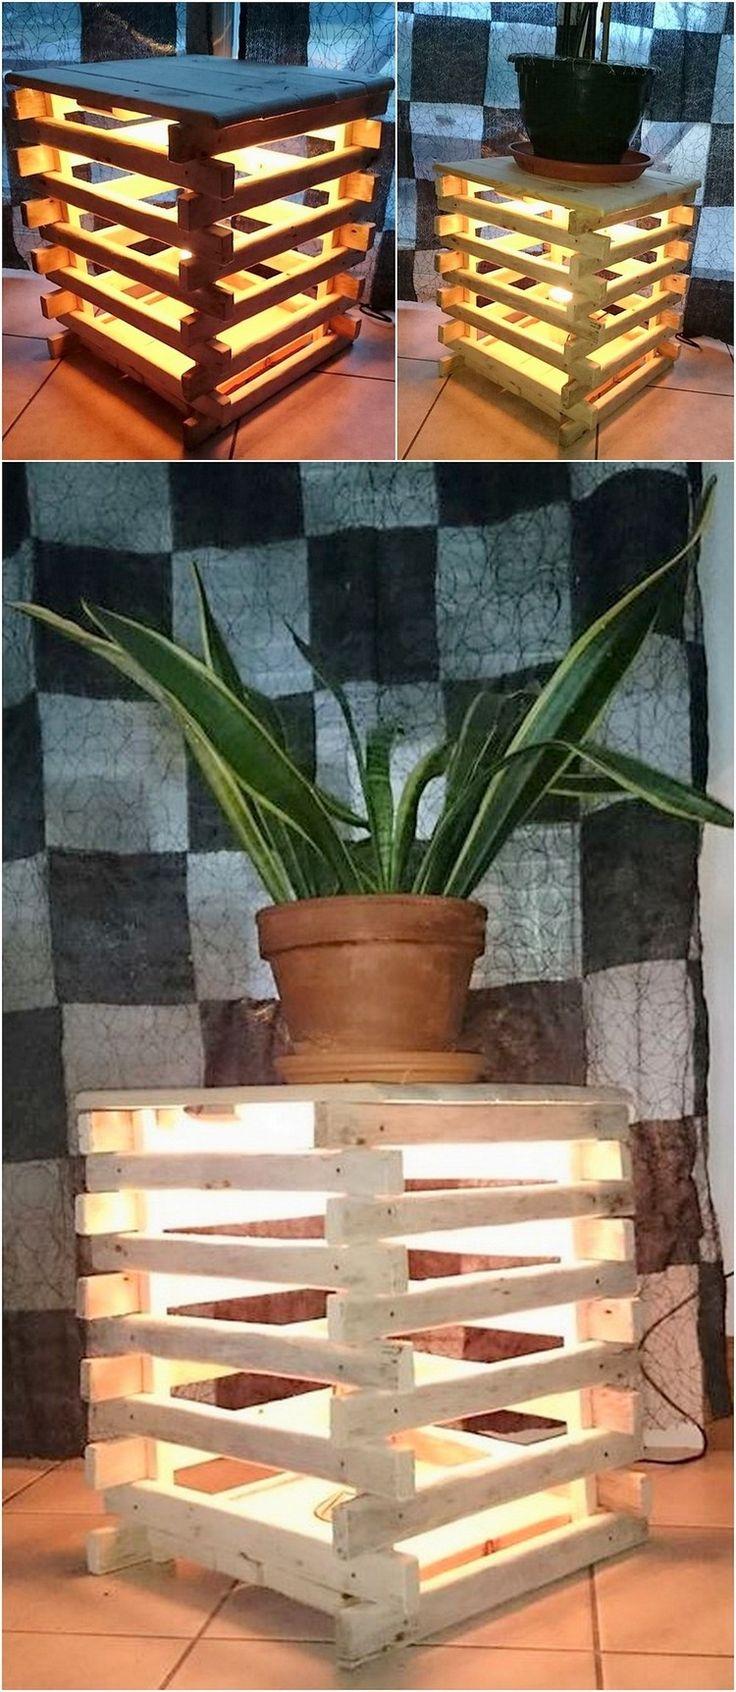 Stunning Wooden Pallet Recycling Ideas